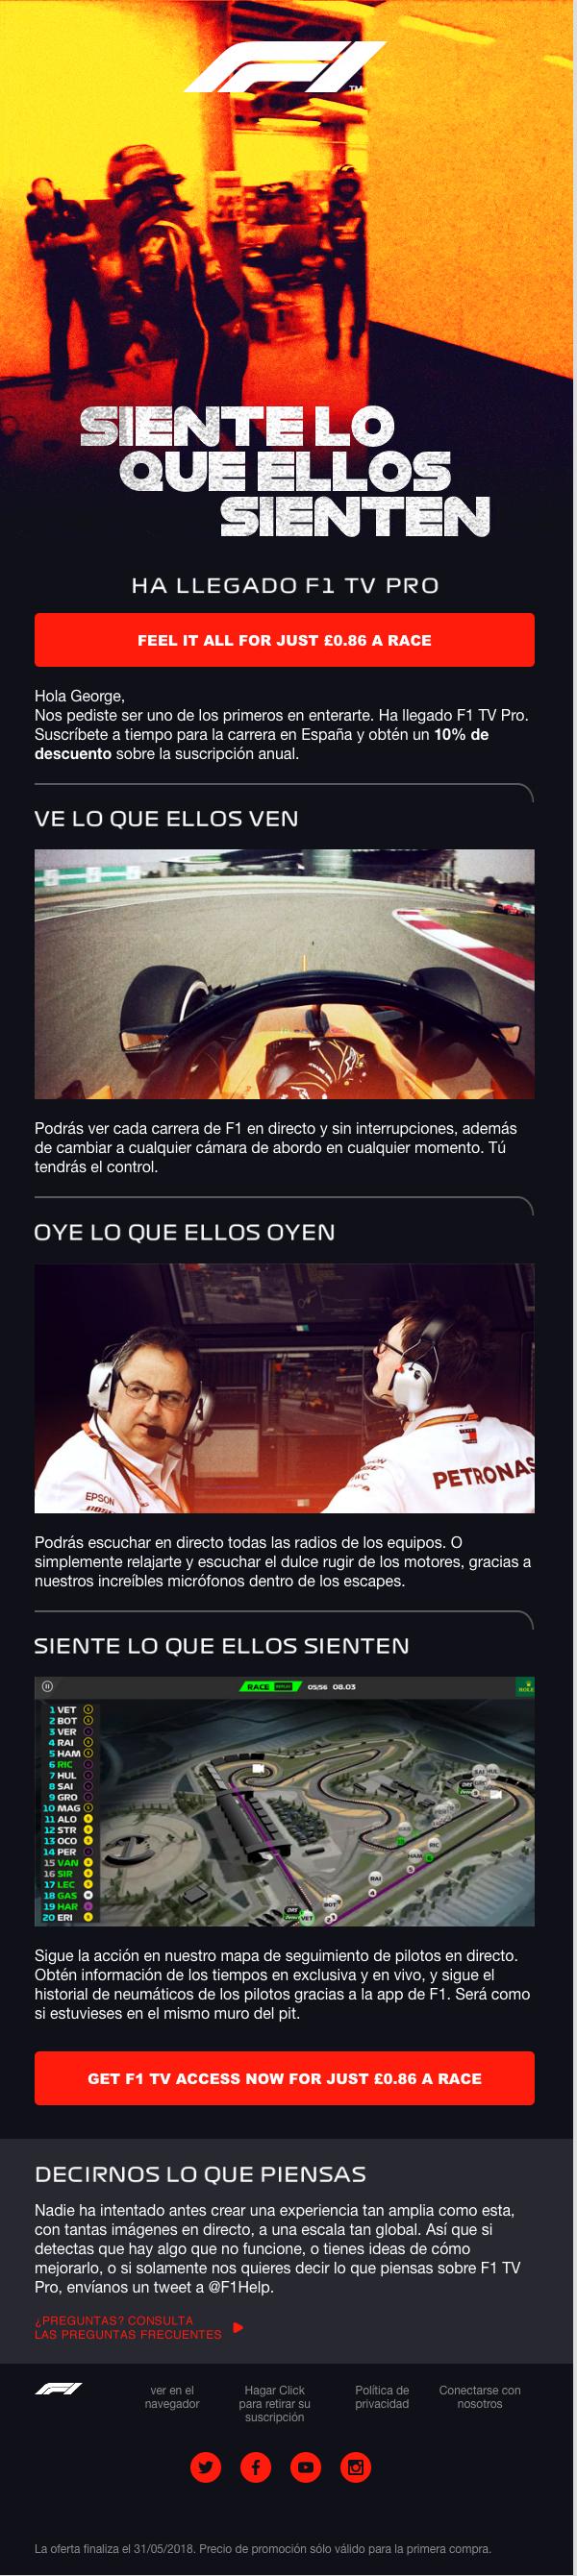 F1 TV Pro App Launch & Follow-up | Craig Mullins